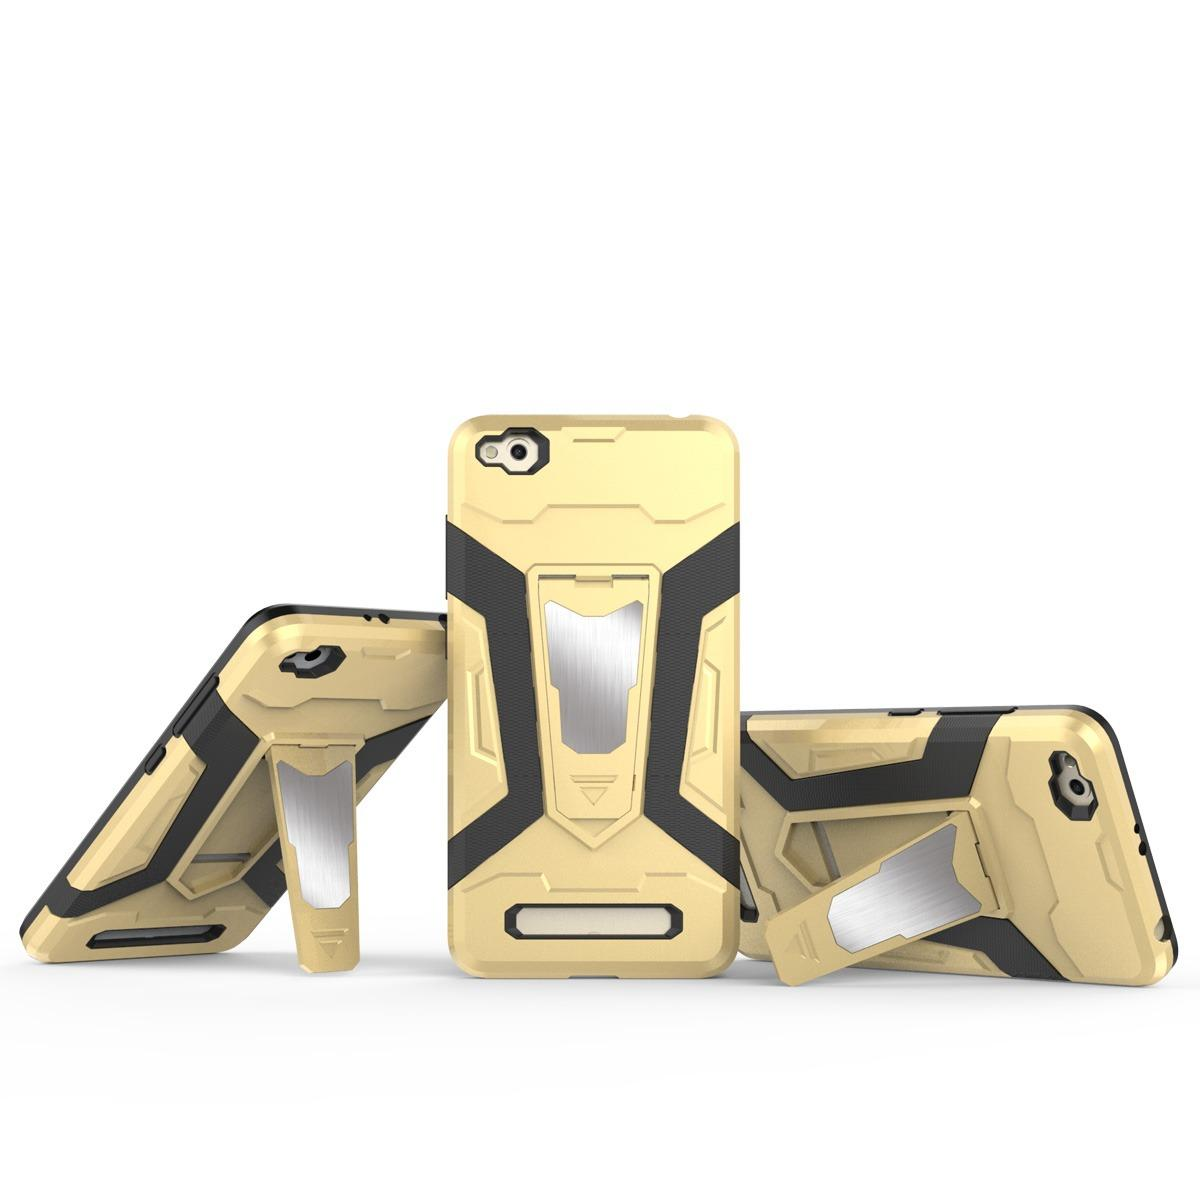 Case Iron Man for Xiaomi Redmi 4A Robot Transformer Ironman Limited - Merah